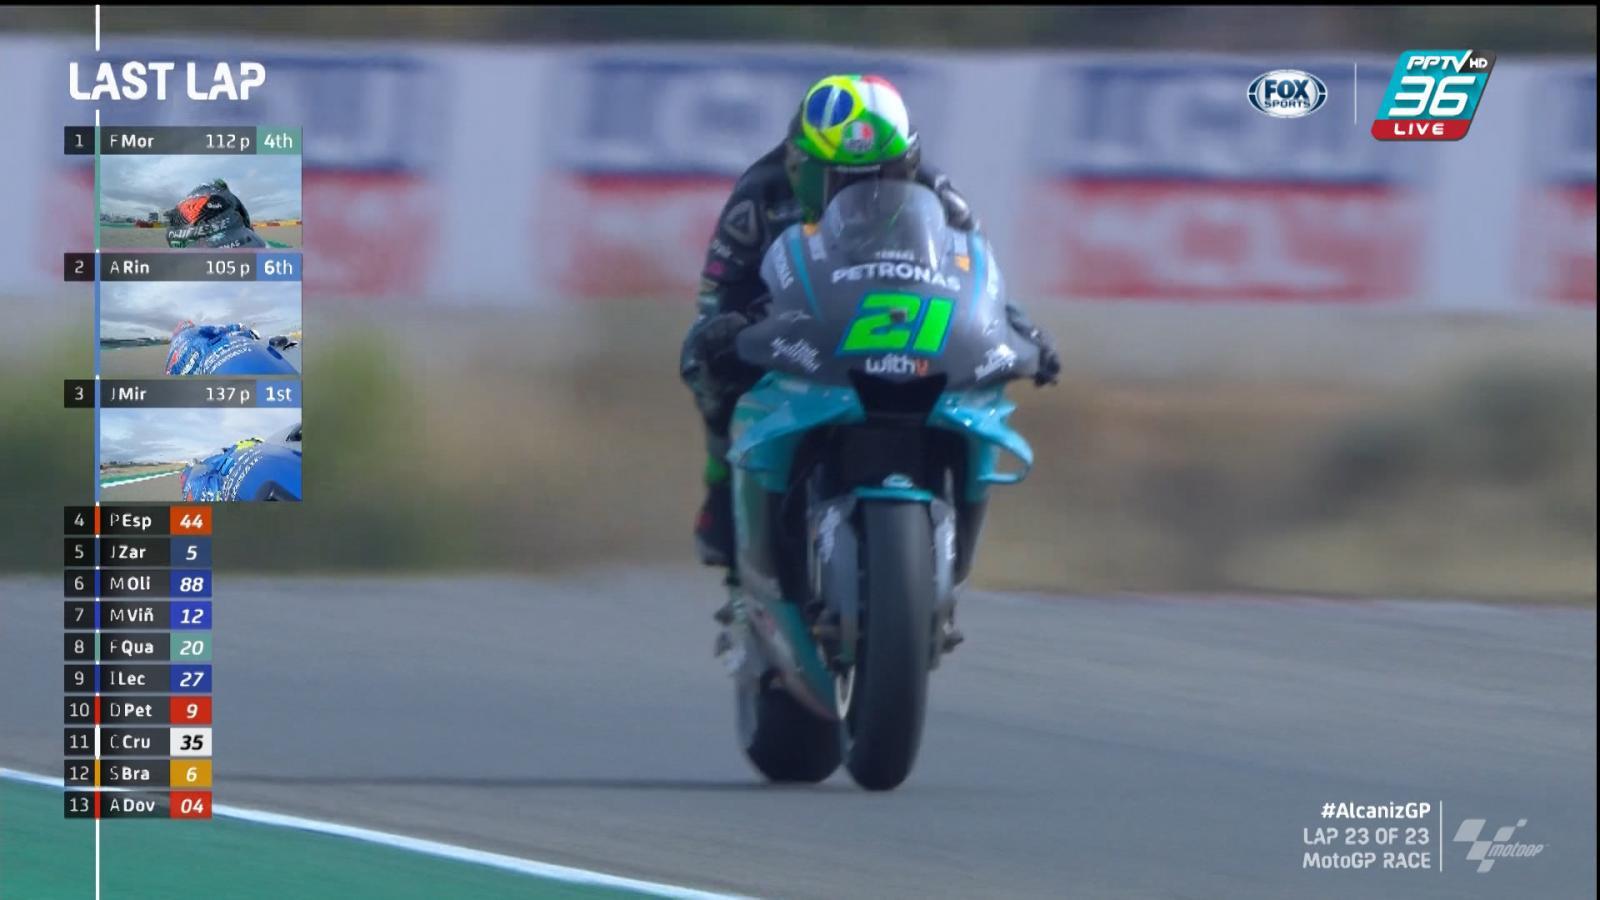 Franco Morbidelli  คว้าเเชมป์ MotoGP สนามที่ 12 ไปครอง